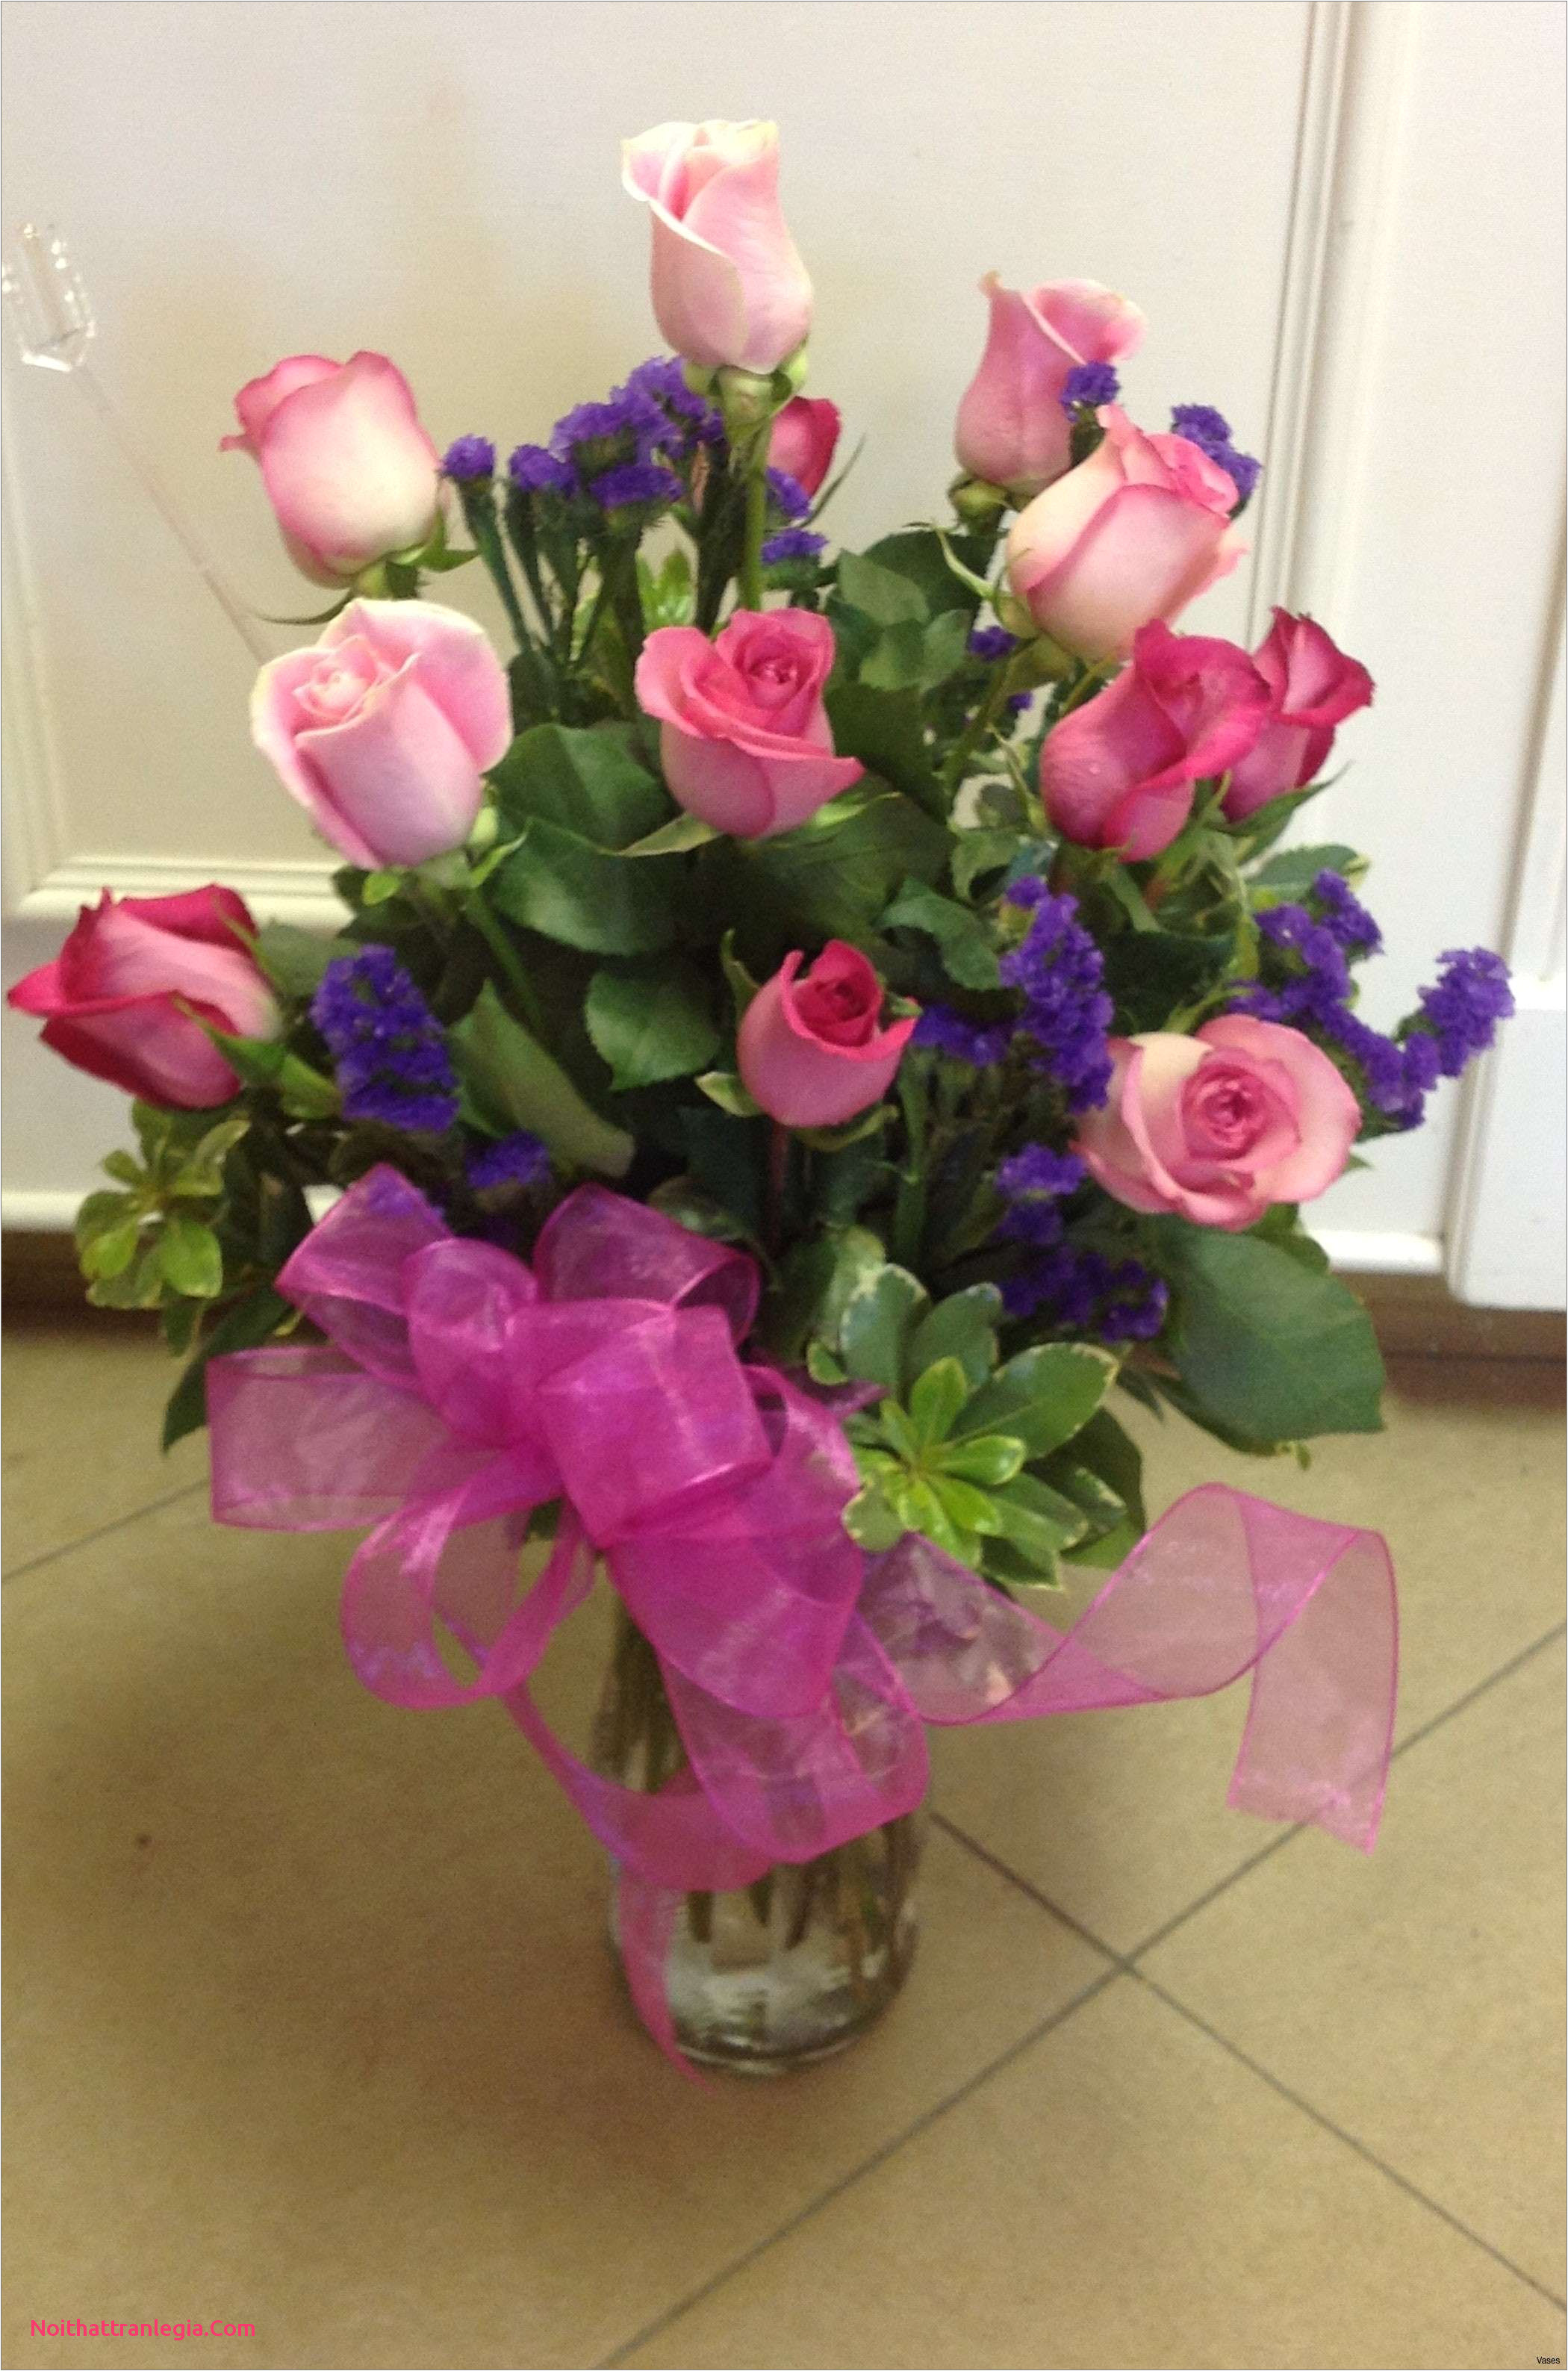 source annaweddingfo 15 cheap and easy diy vase filler ideas 3h vases